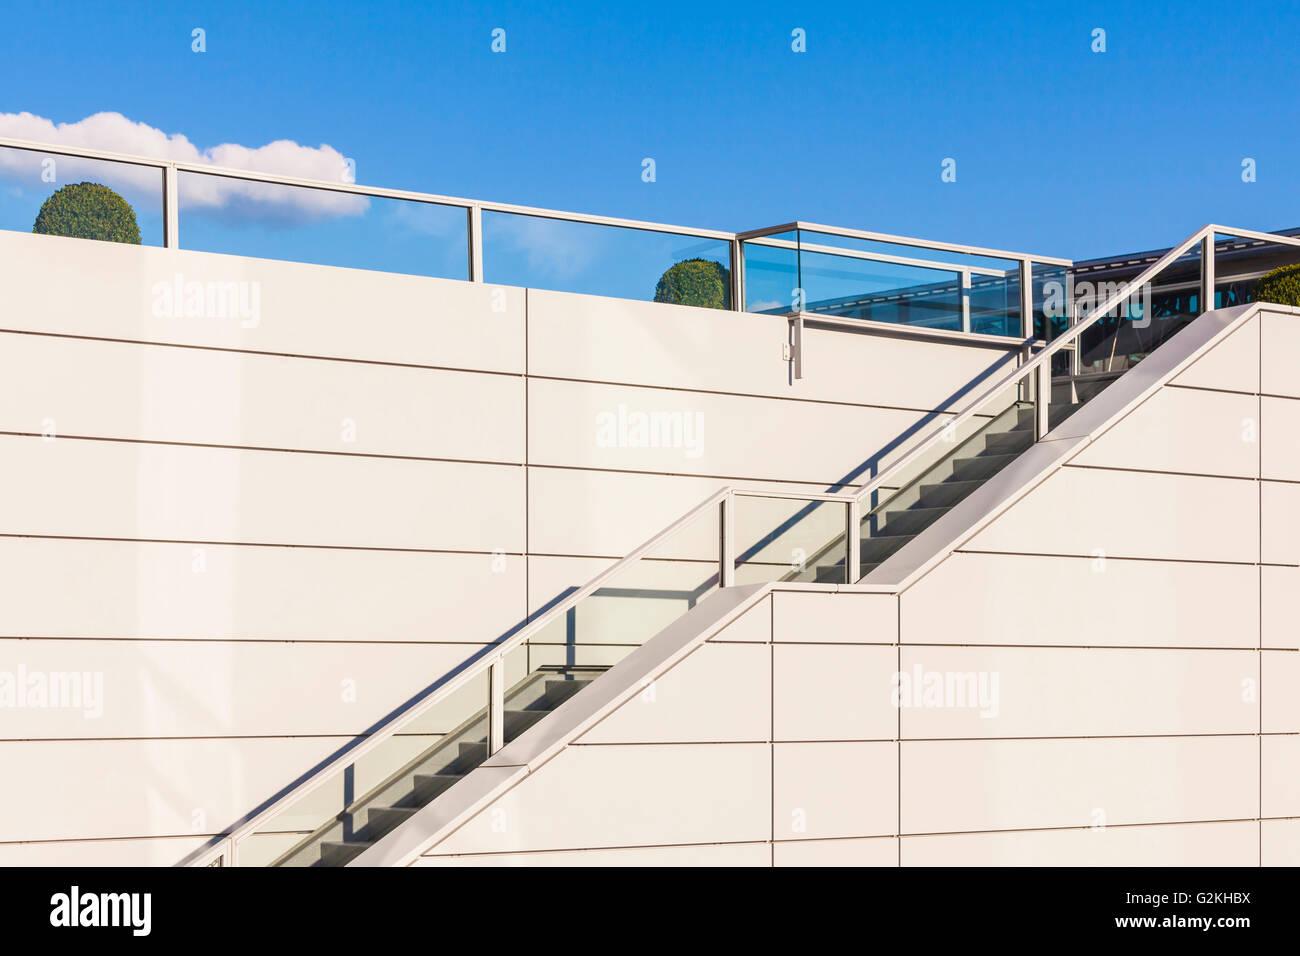 Stairs and railing, upwards - Stock Image